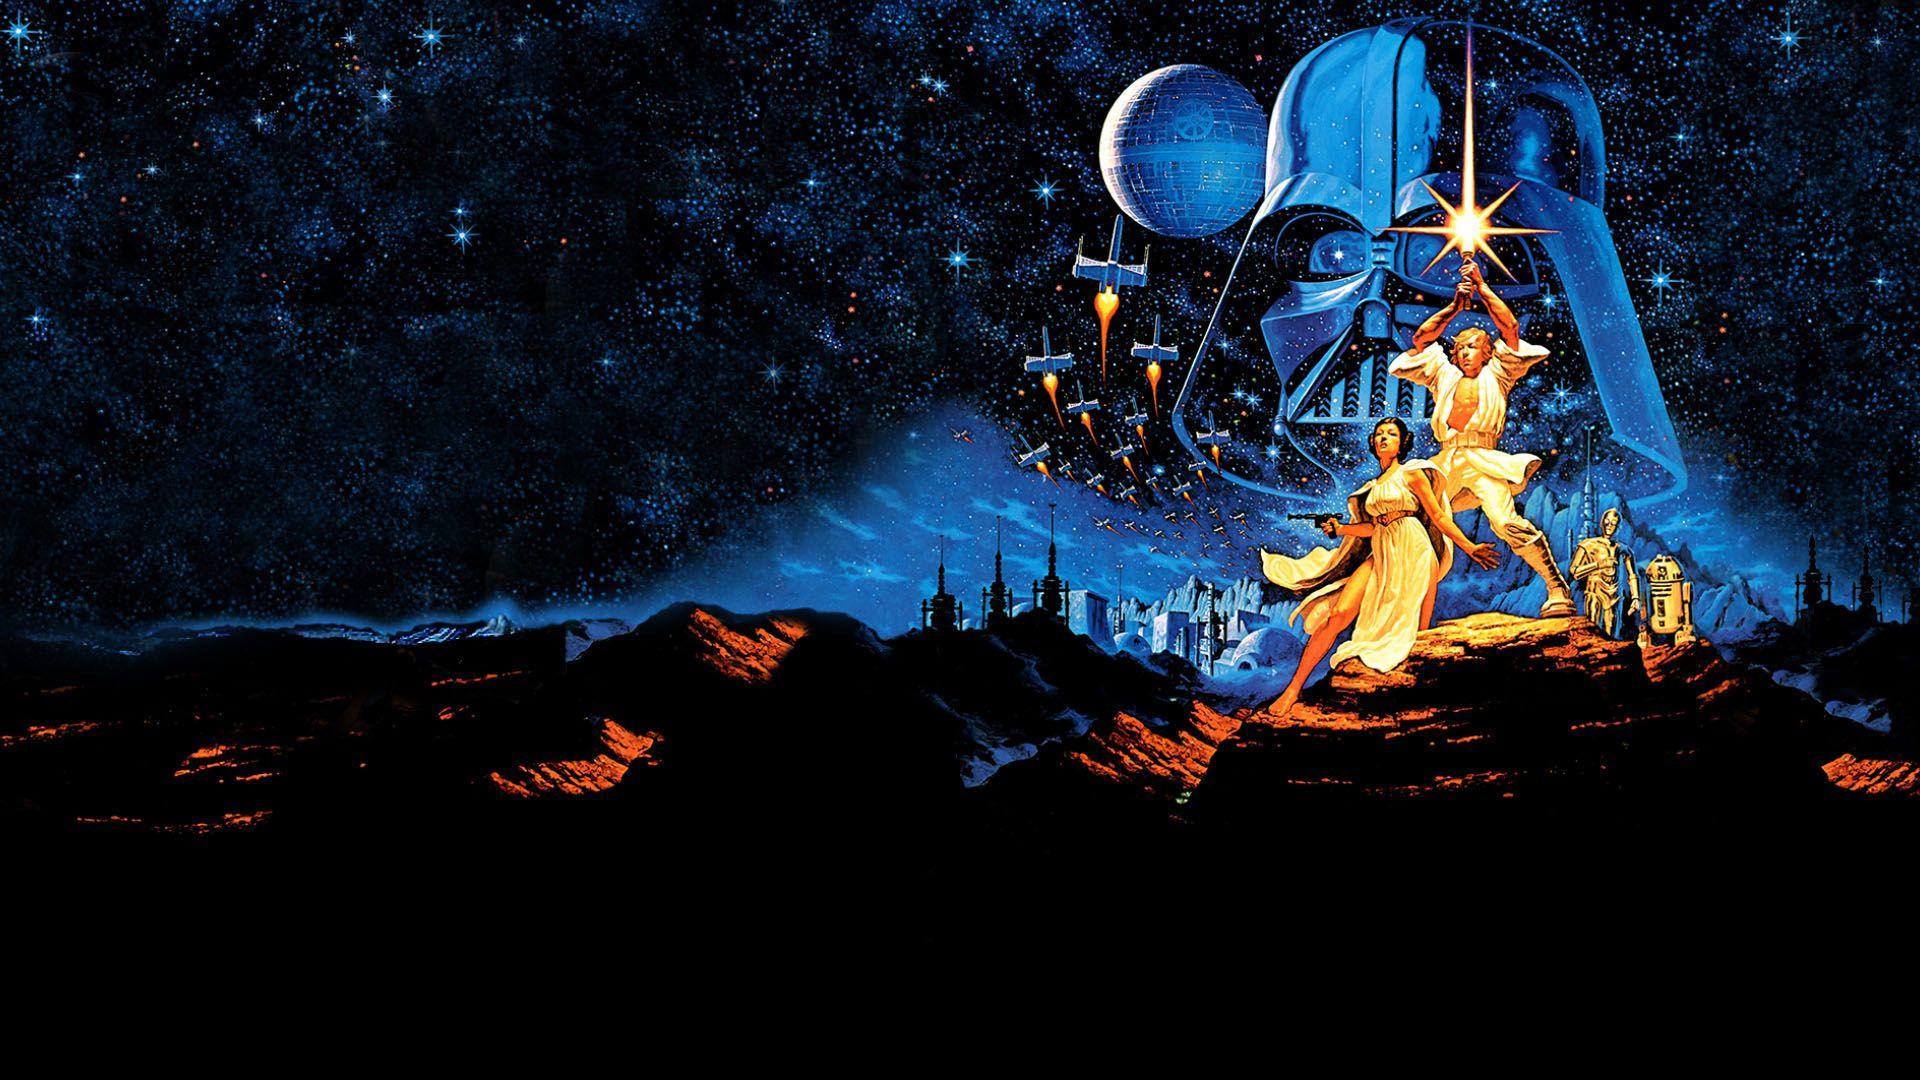 Star Wars Screensaver Background Wallpaper